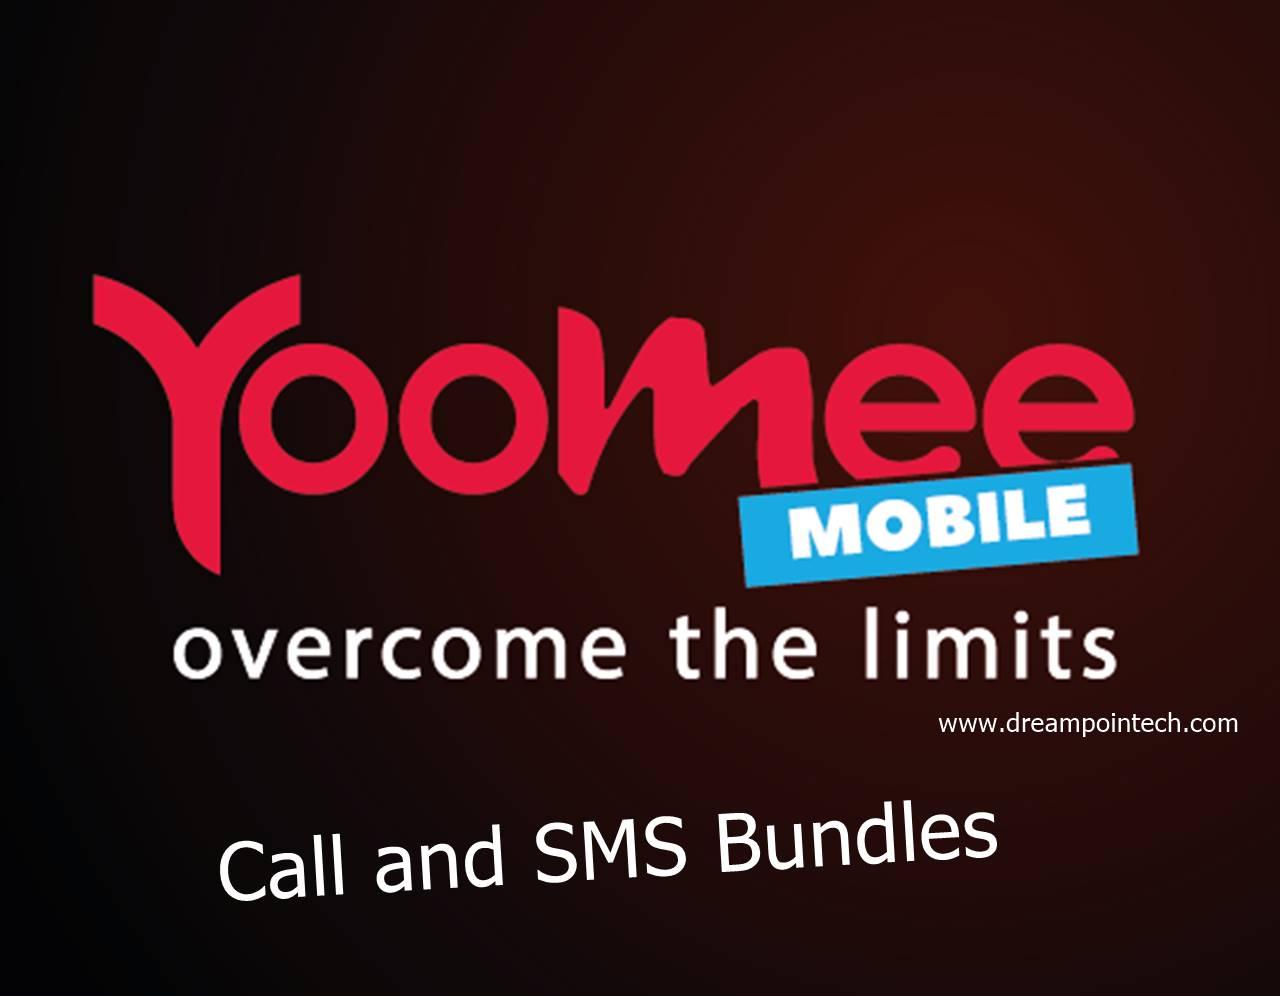 Yoomee Call and SMS Bundles